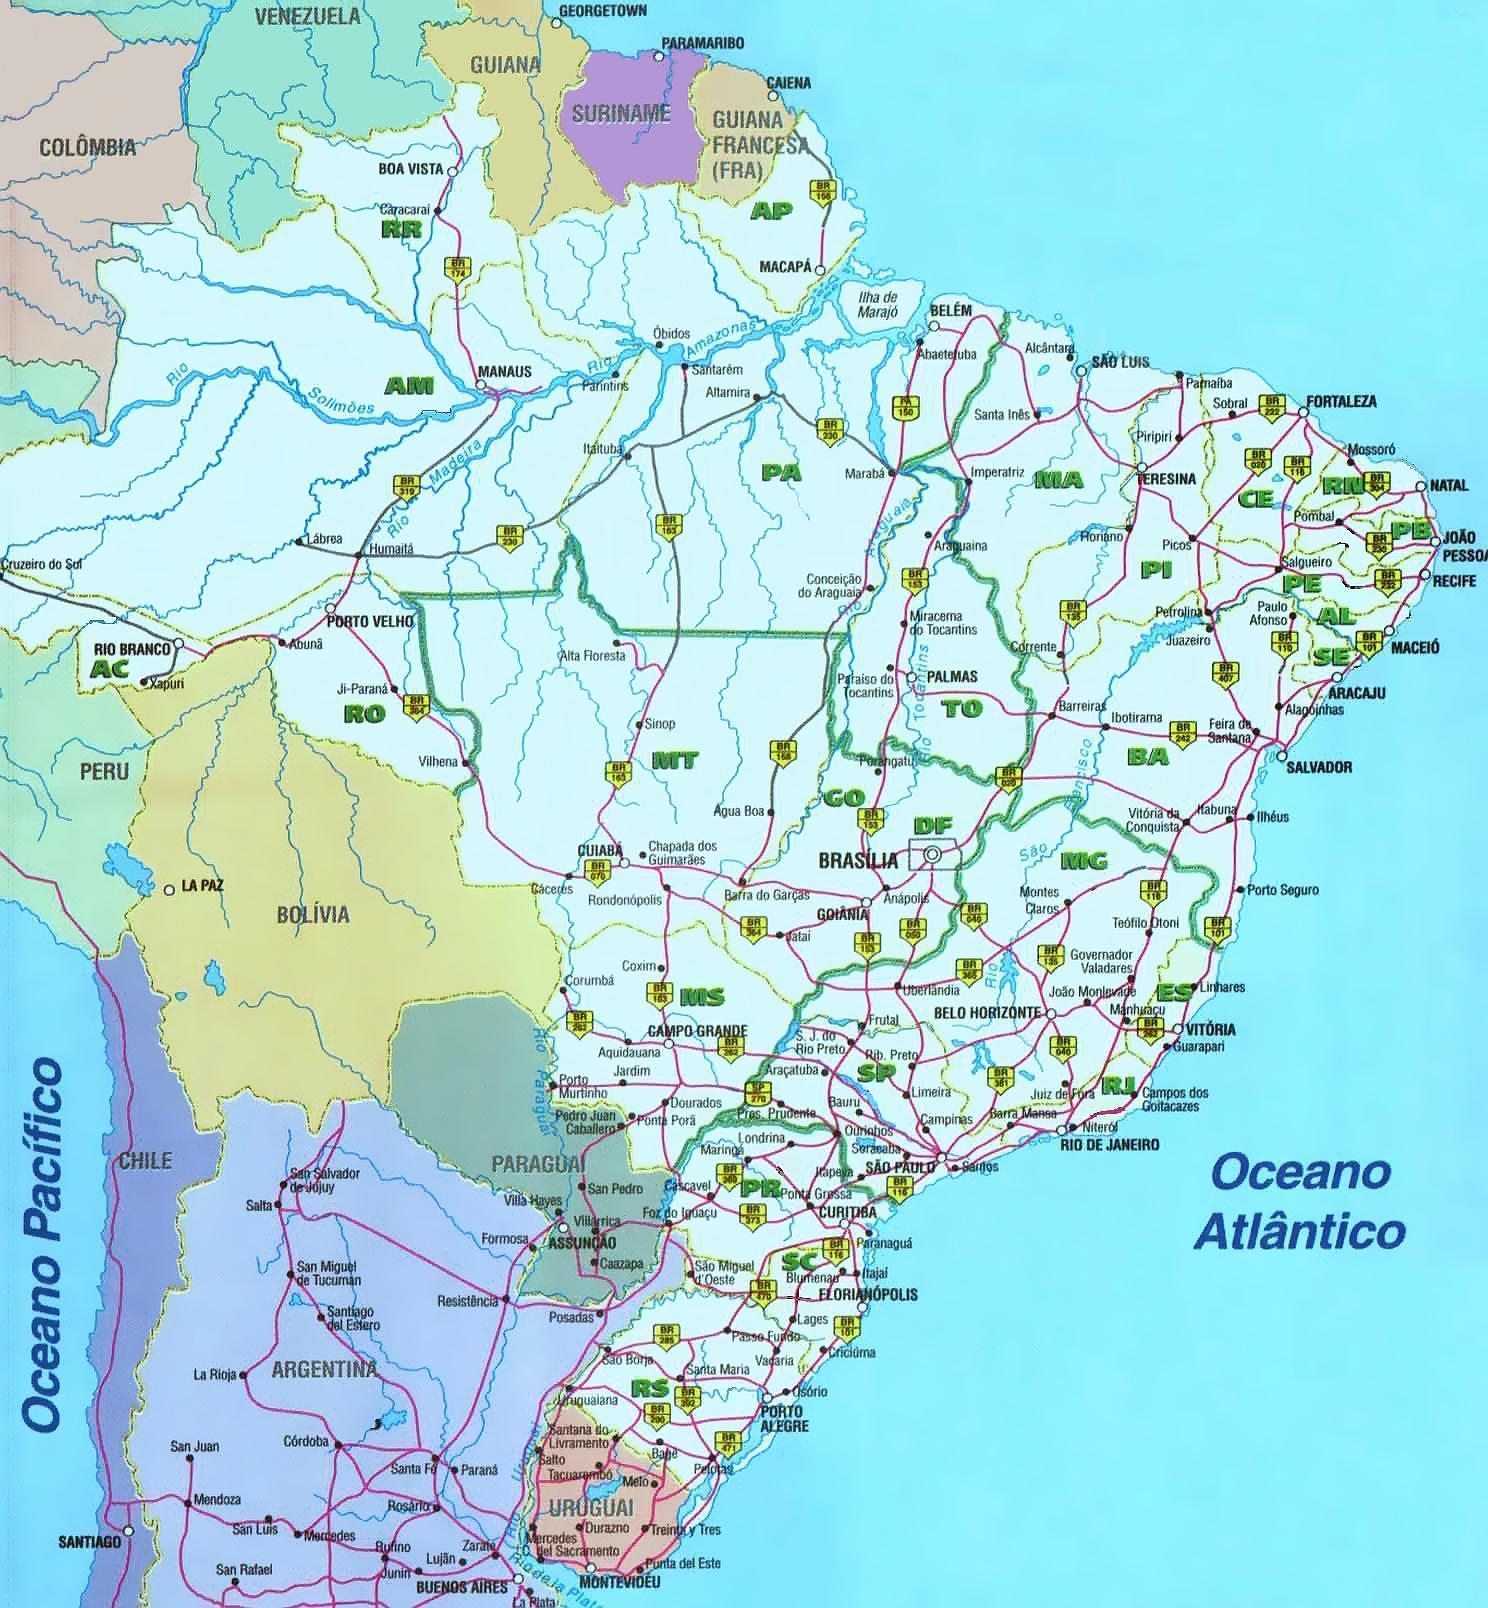 Brazílie Mapy, Mapy Brazílie, Mapa Brazílie